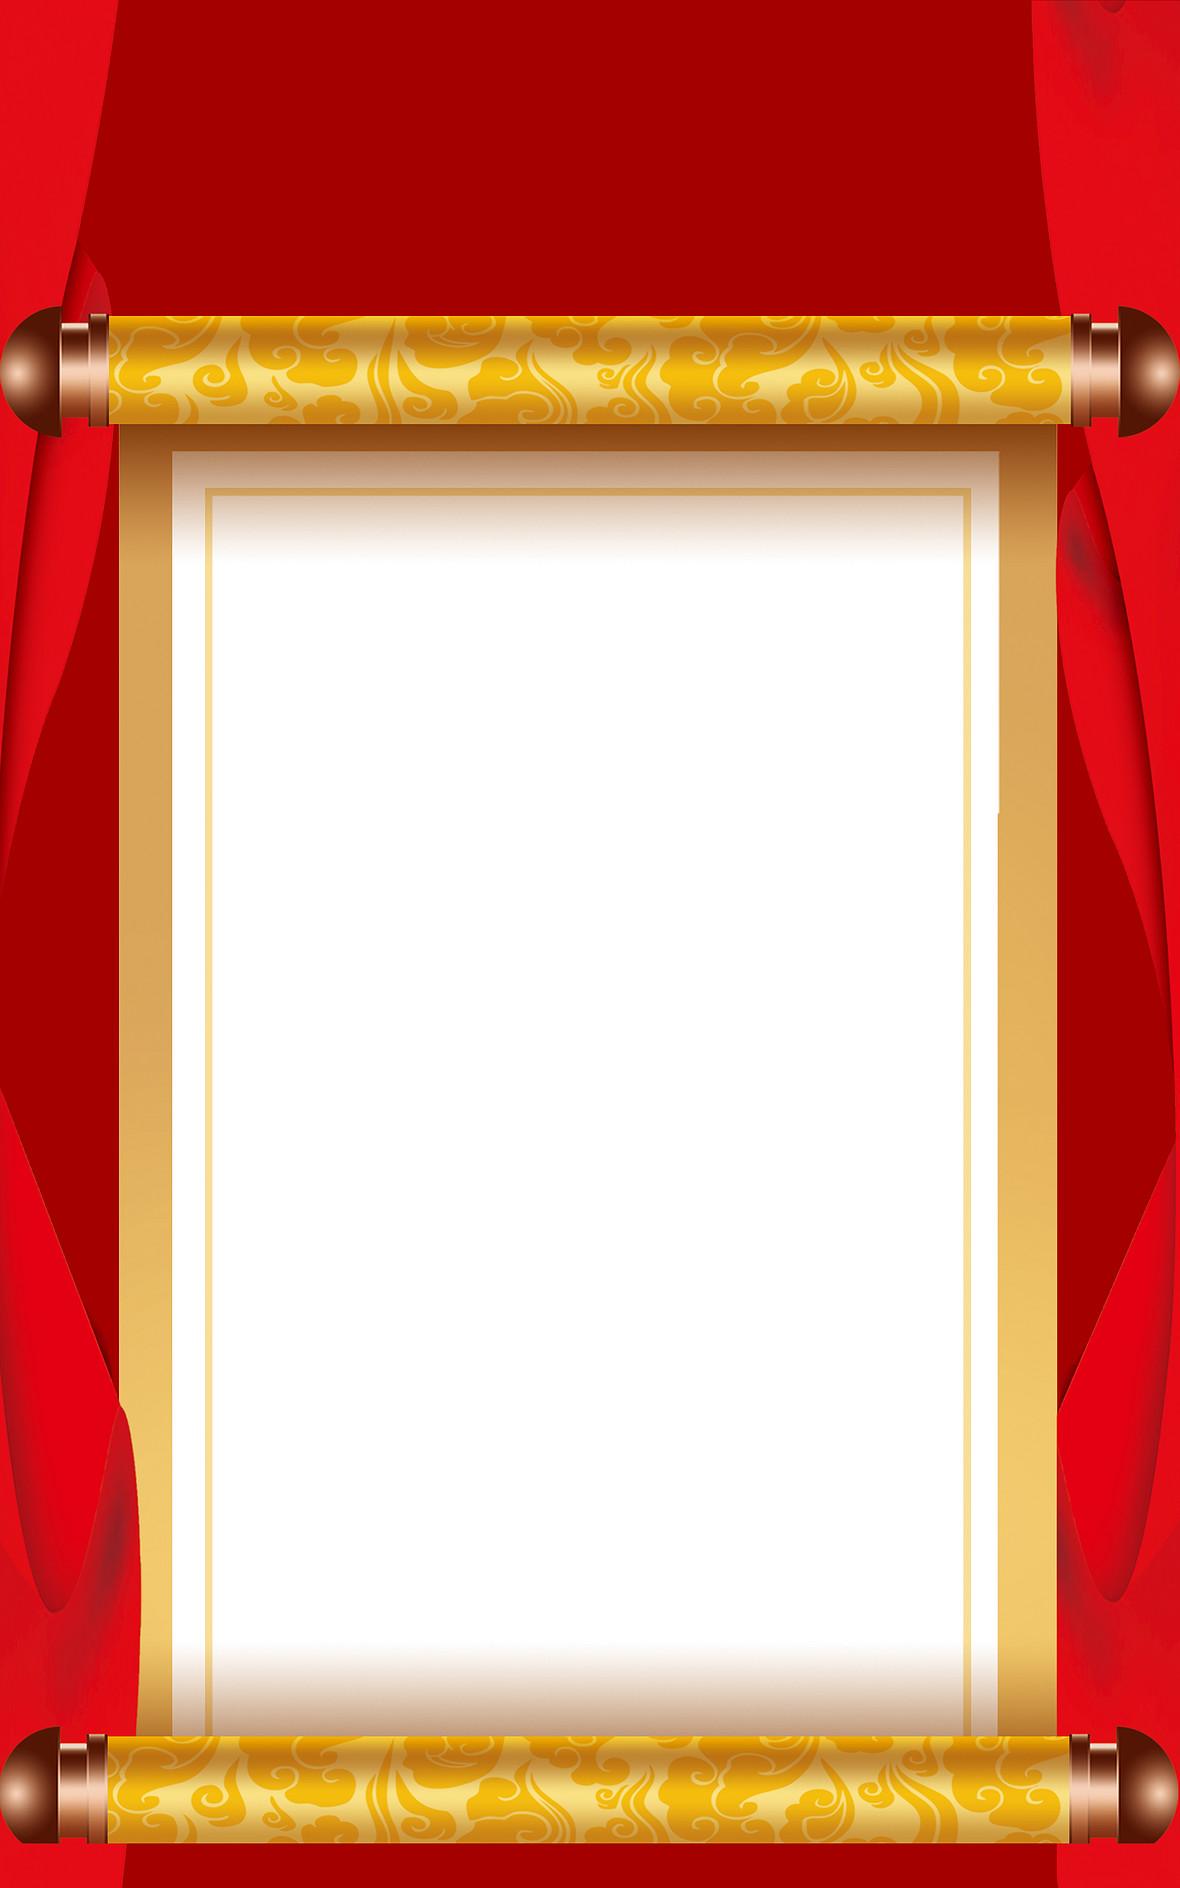 ppt 背景 背景图片 边框 模板 设计 矢量 矢量图 素材 相框 1180_1888